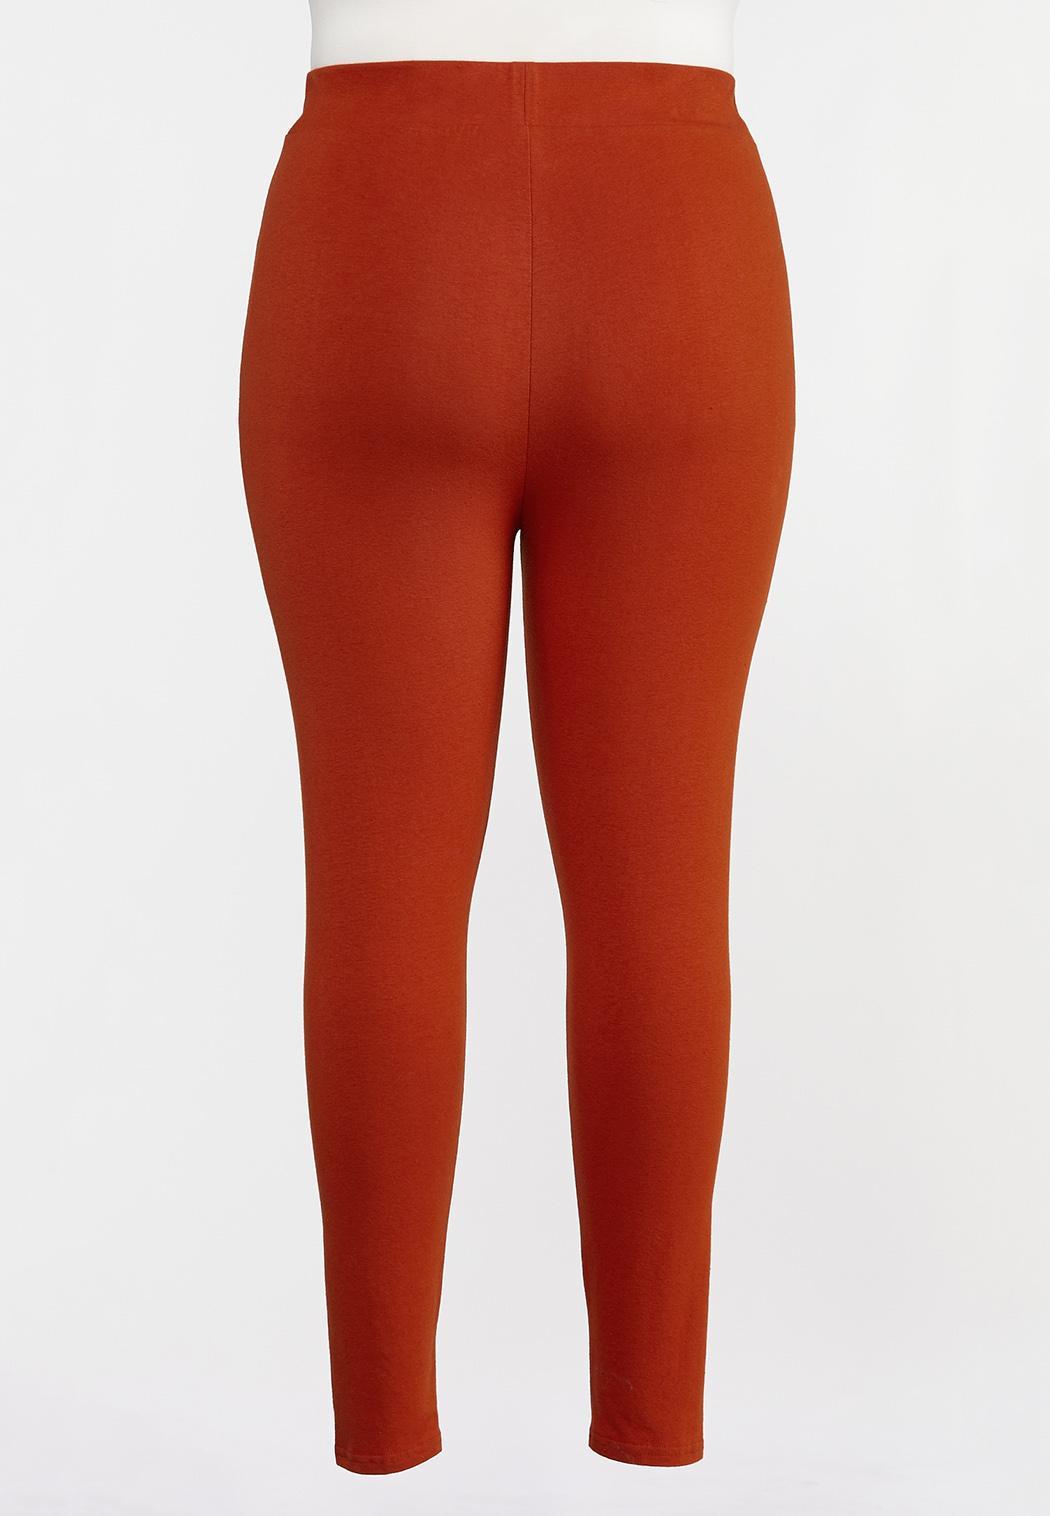 Plus Size Casual Knit Leggings (Item #44319448)